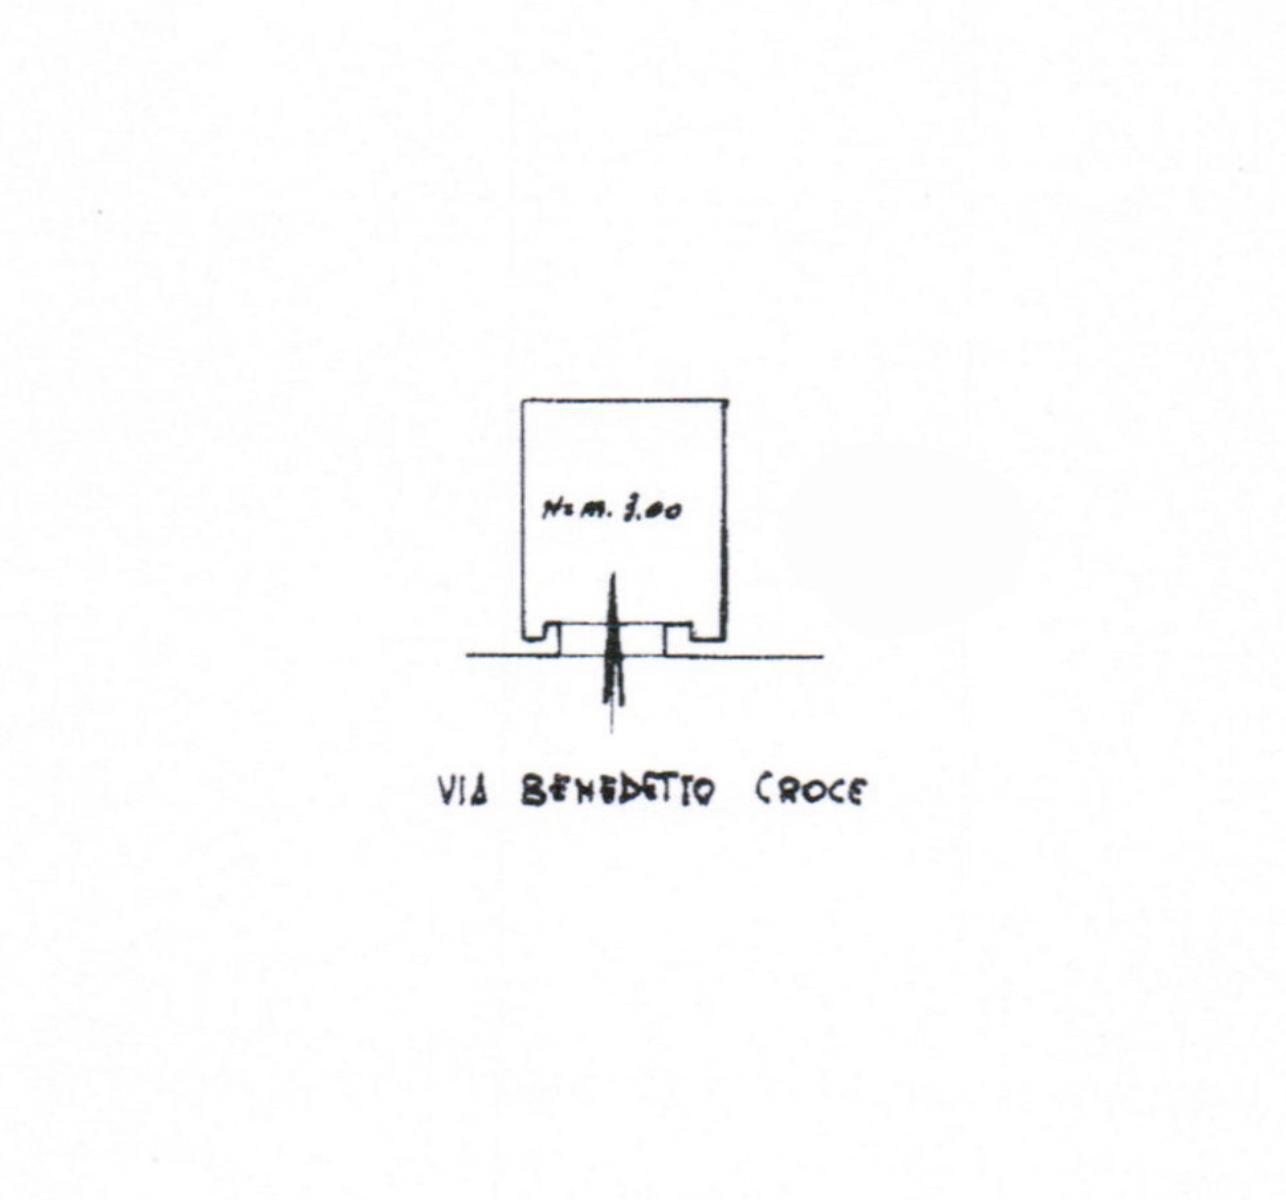 Vendita appartamento – Viale Domenico Carella, Martina Franca (Taranto)